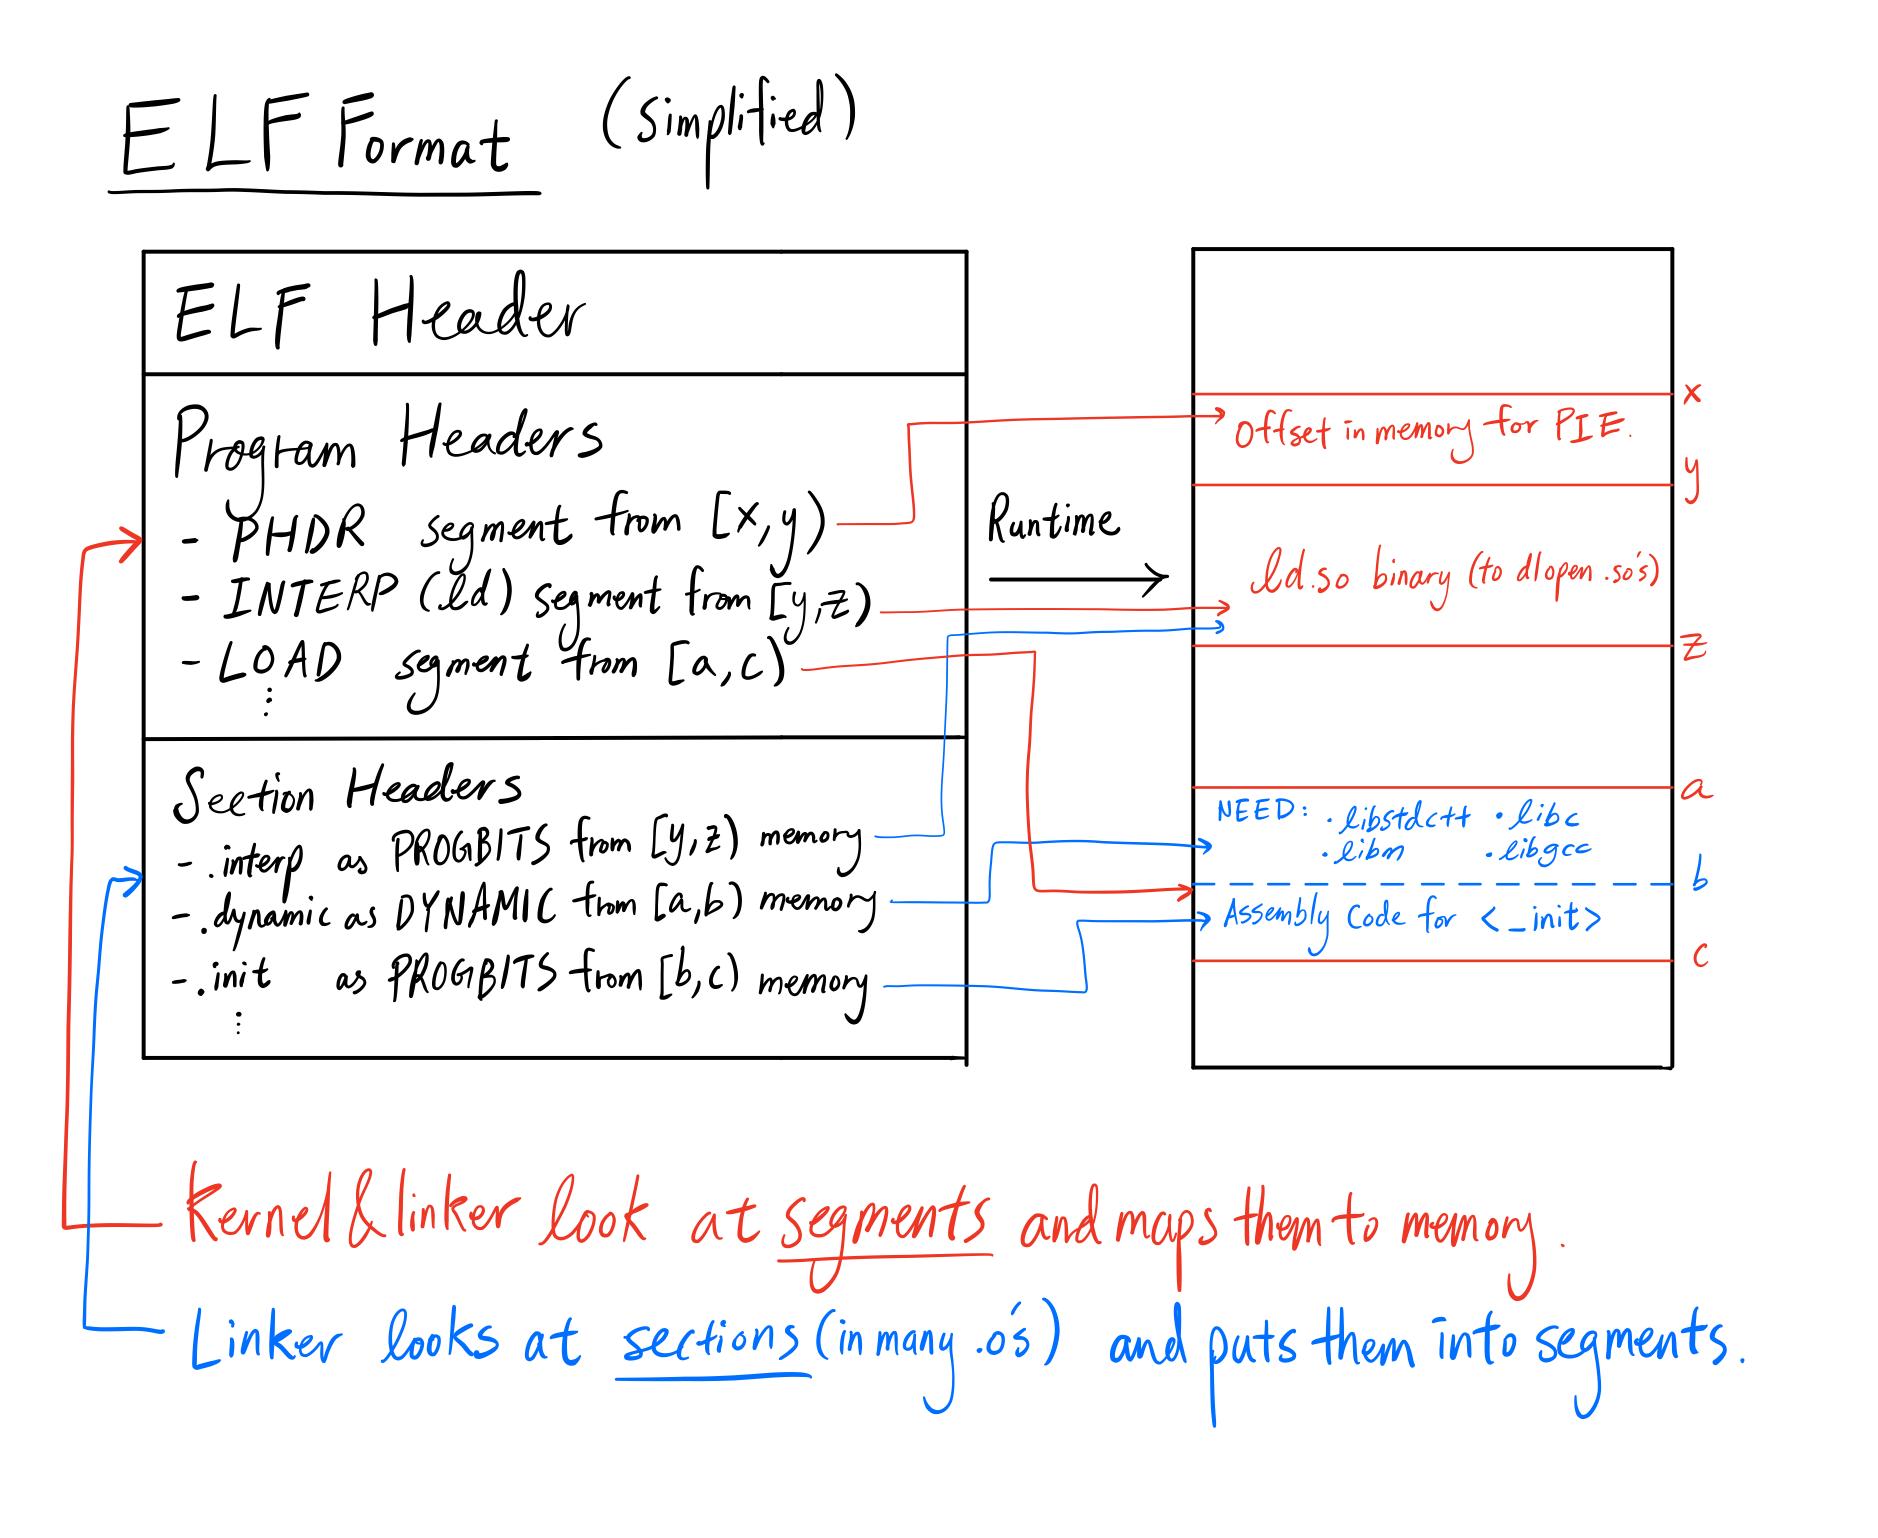 elf_format